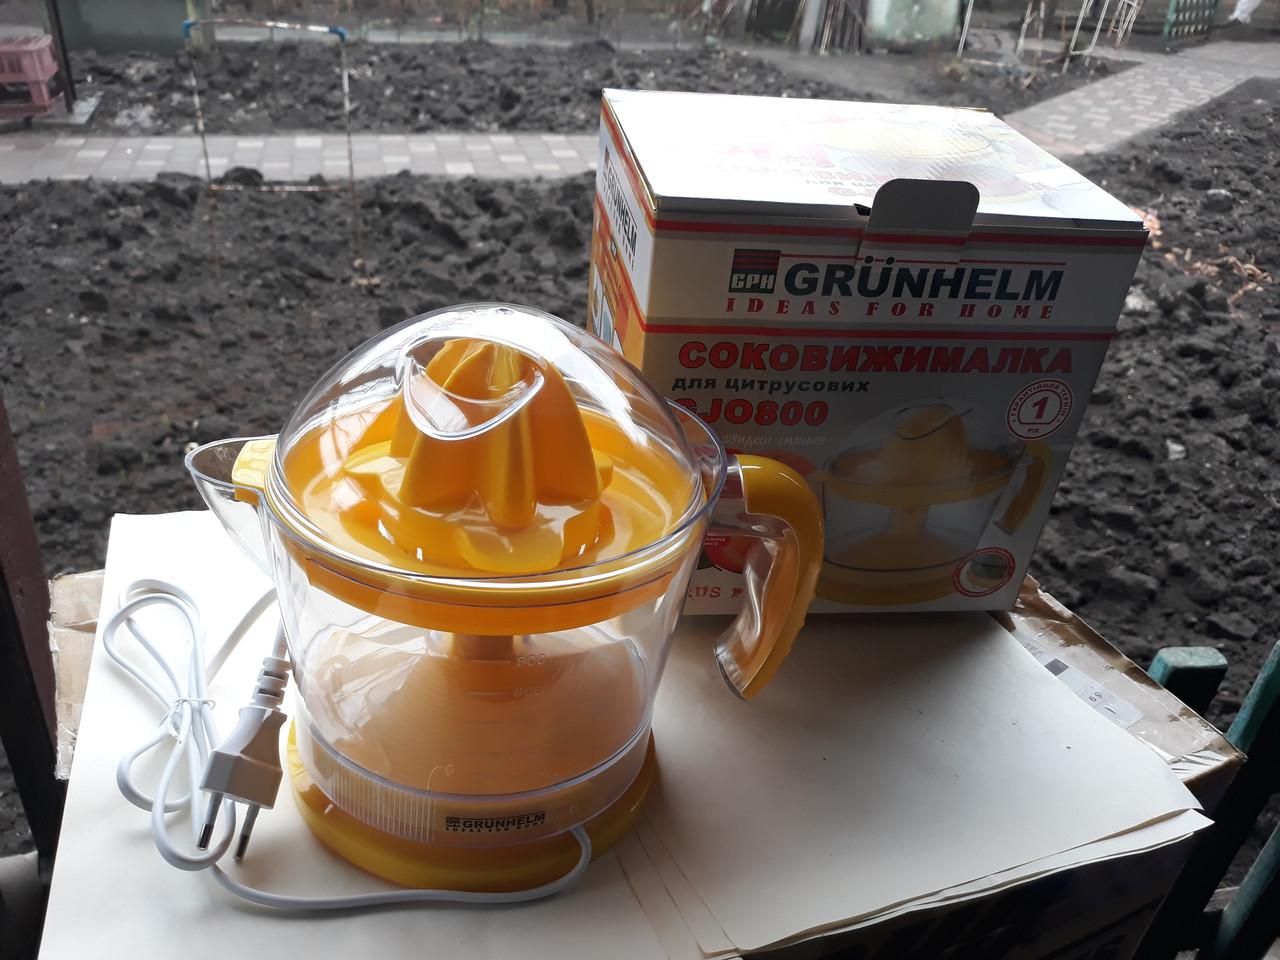 Соковыжималка Grunhelm GJO800 для цитрусовых